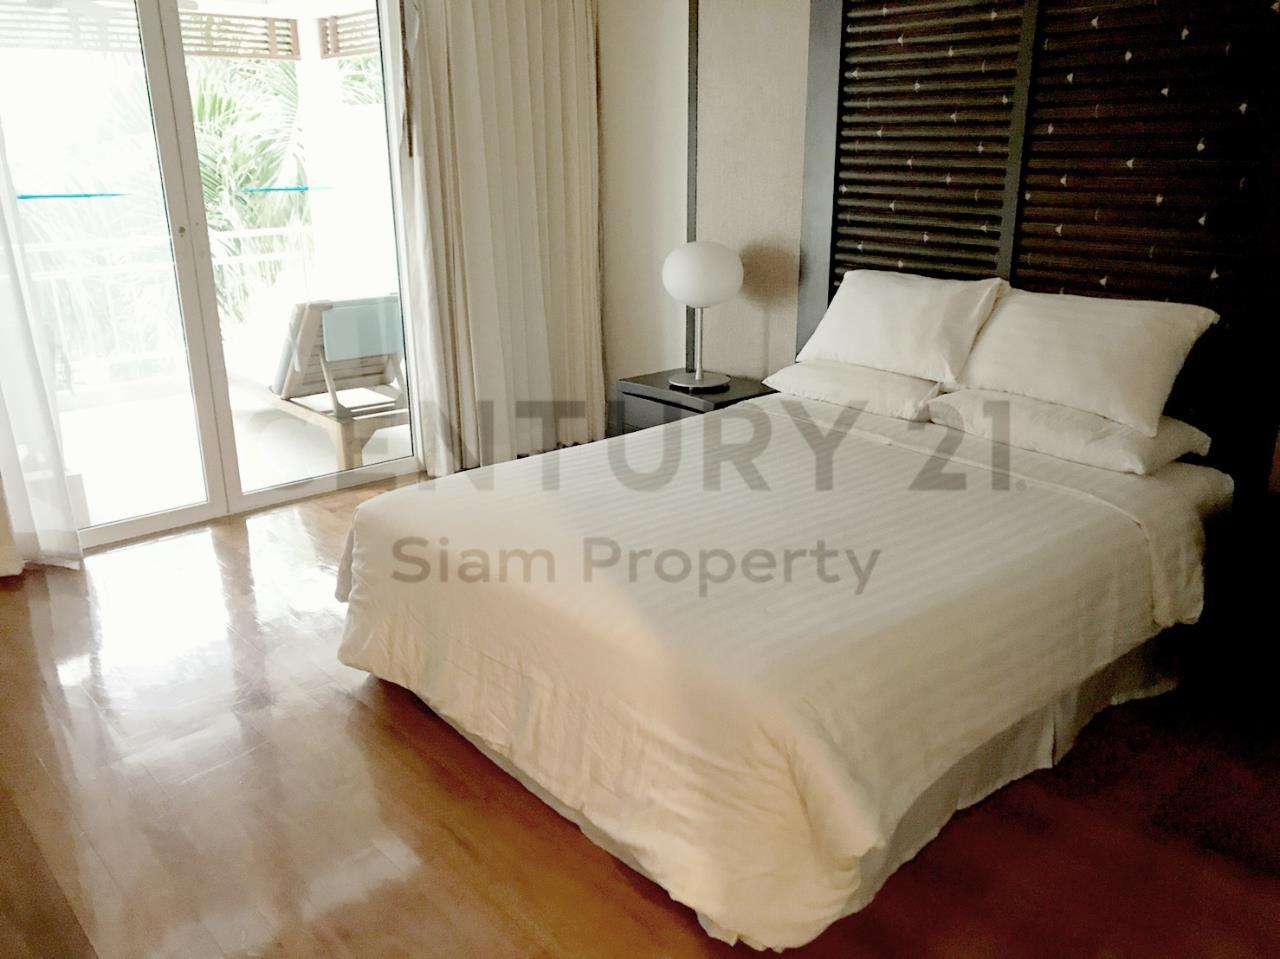 Century21 Siam Property Agency's The Bel Air Panwa 5